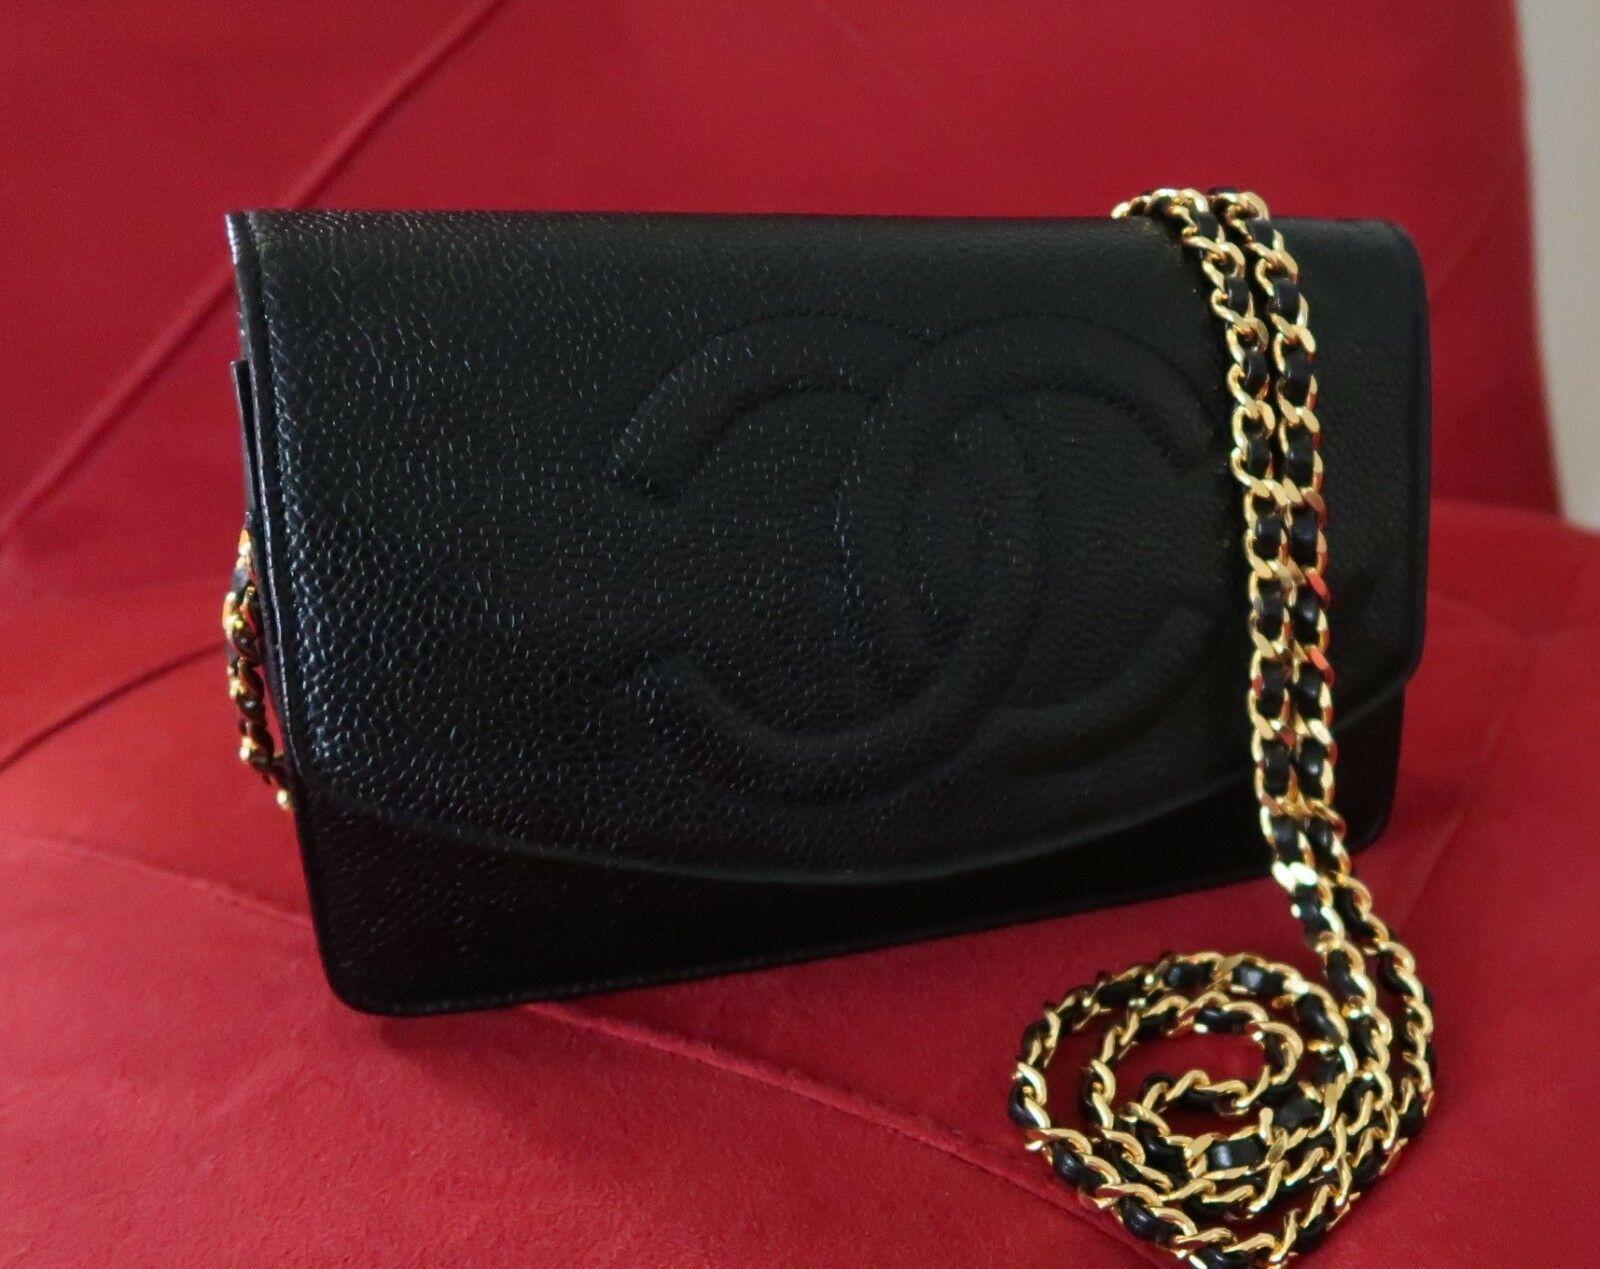 852d1523f49e Details about CHANEL Authentic Caviar Wallet On Chain WOC Black MINI ...